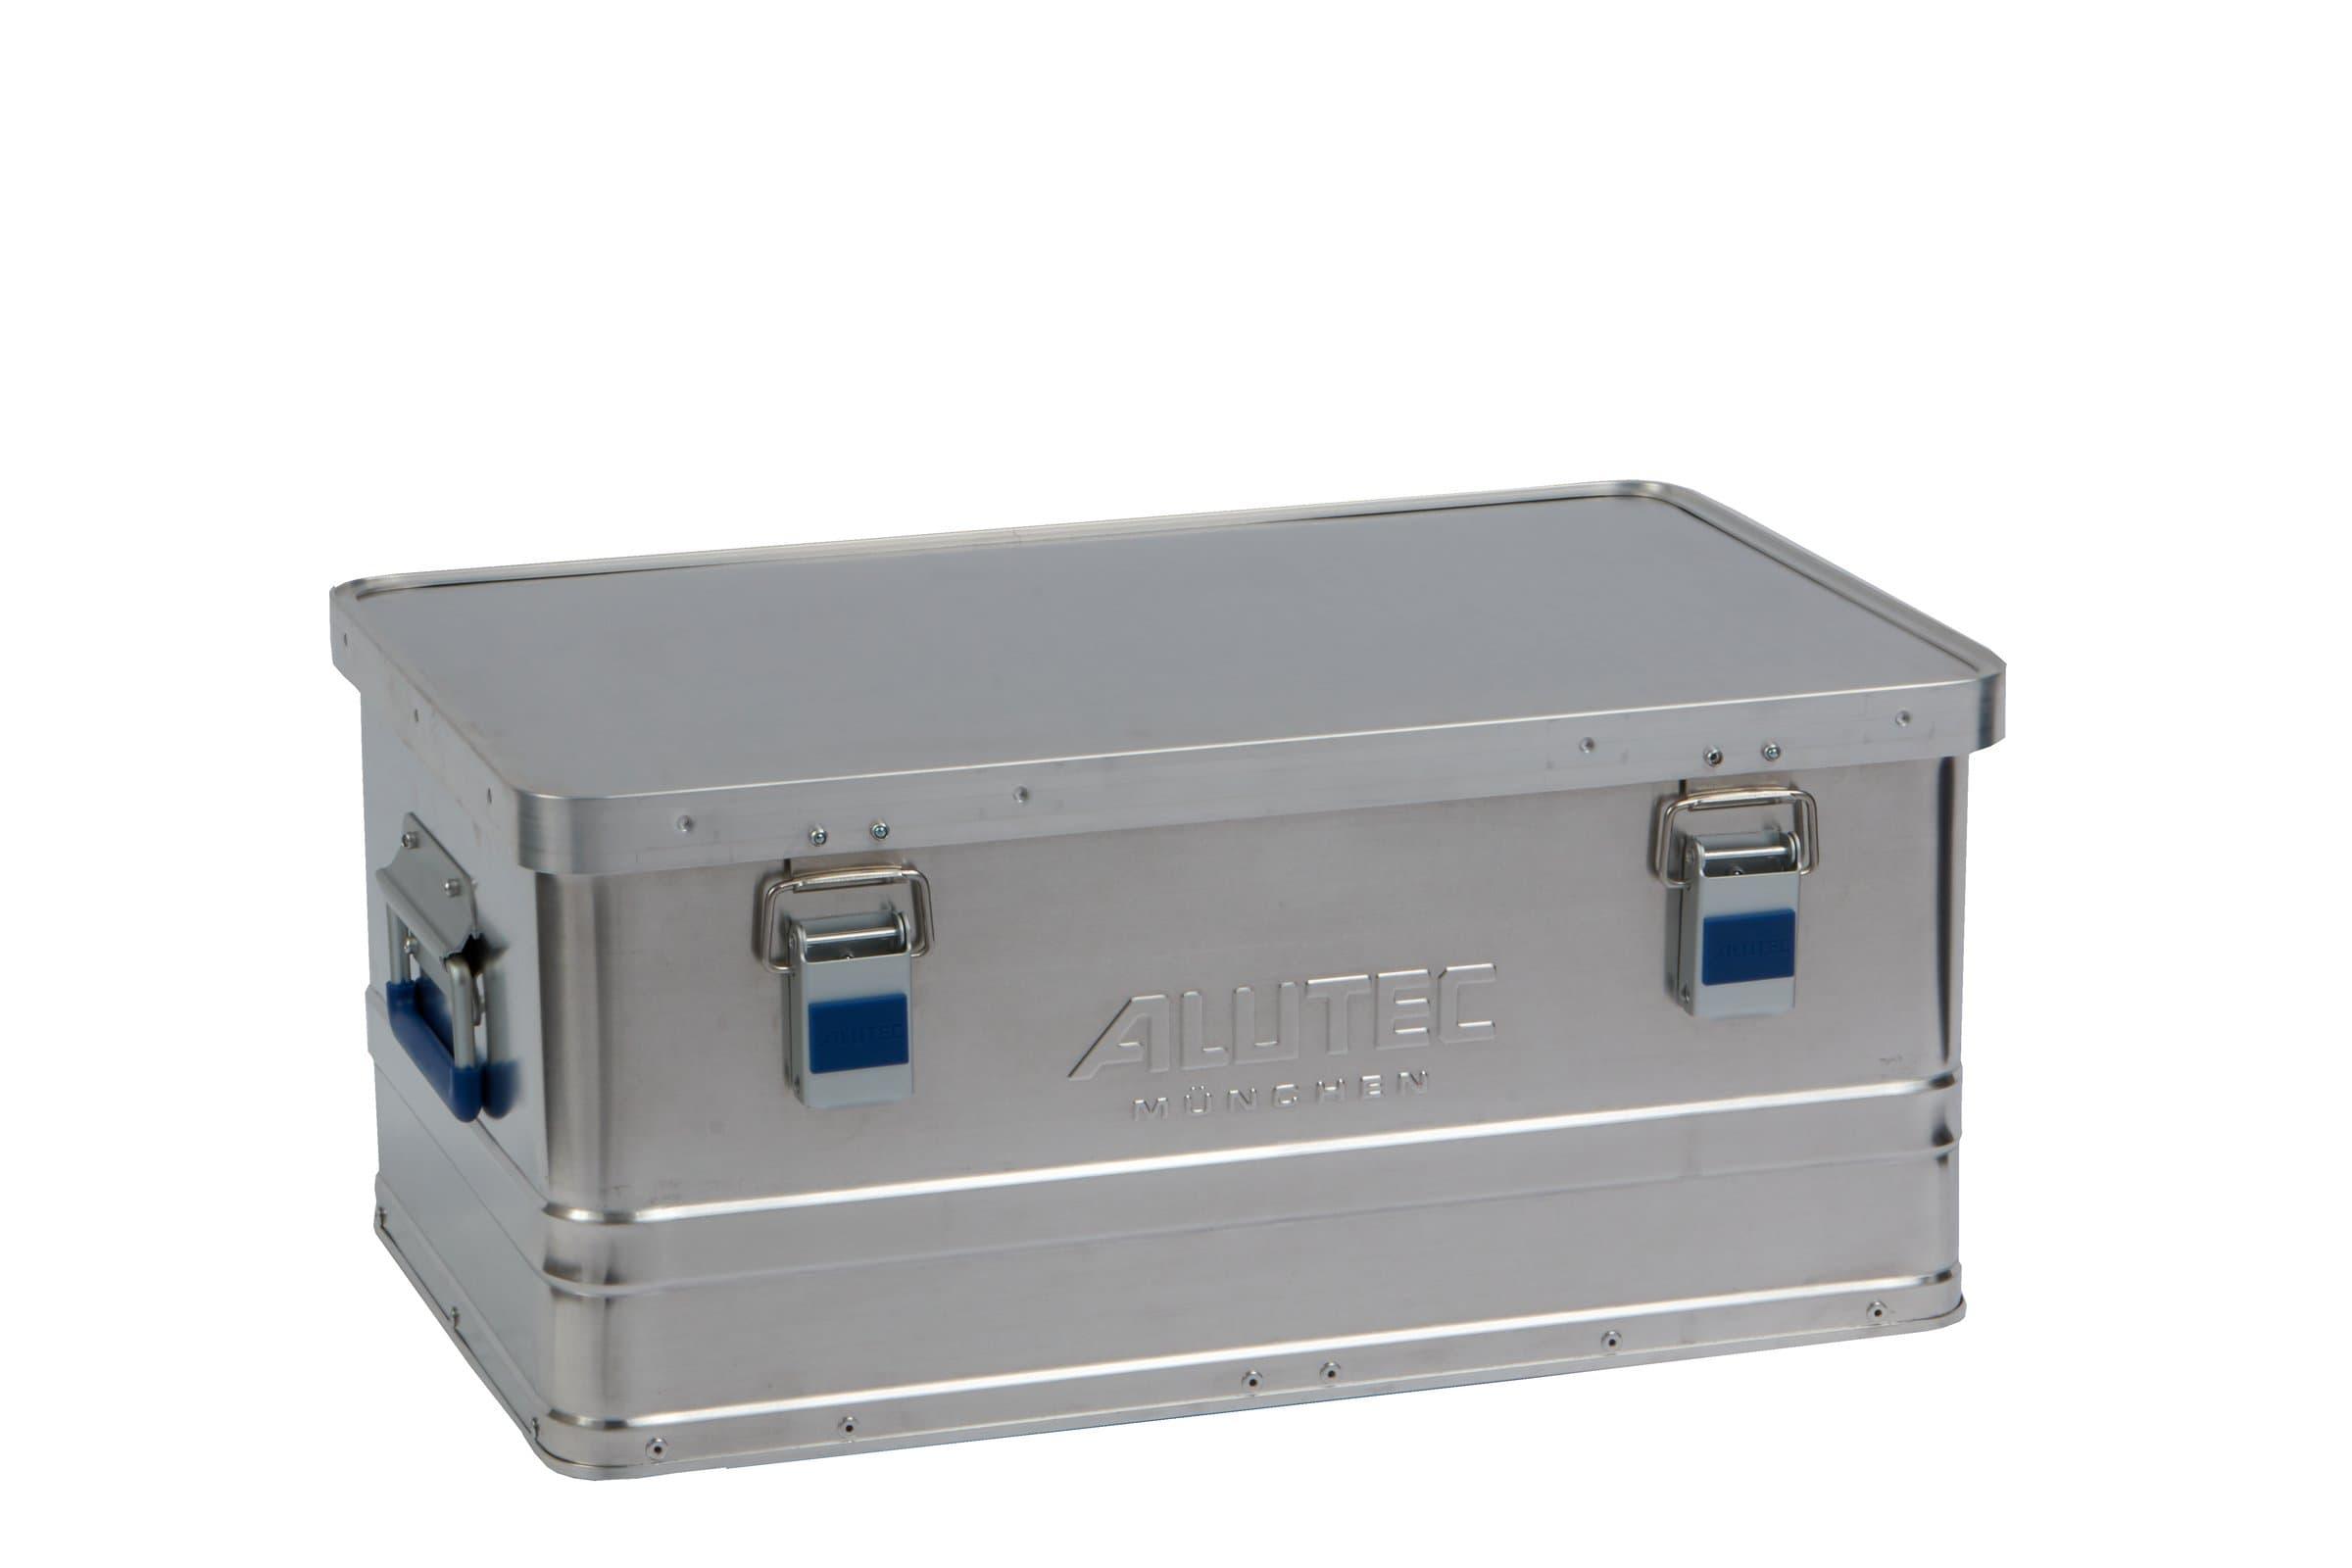 Alutec Aluminiumbox BASIC 40 0.8 mm